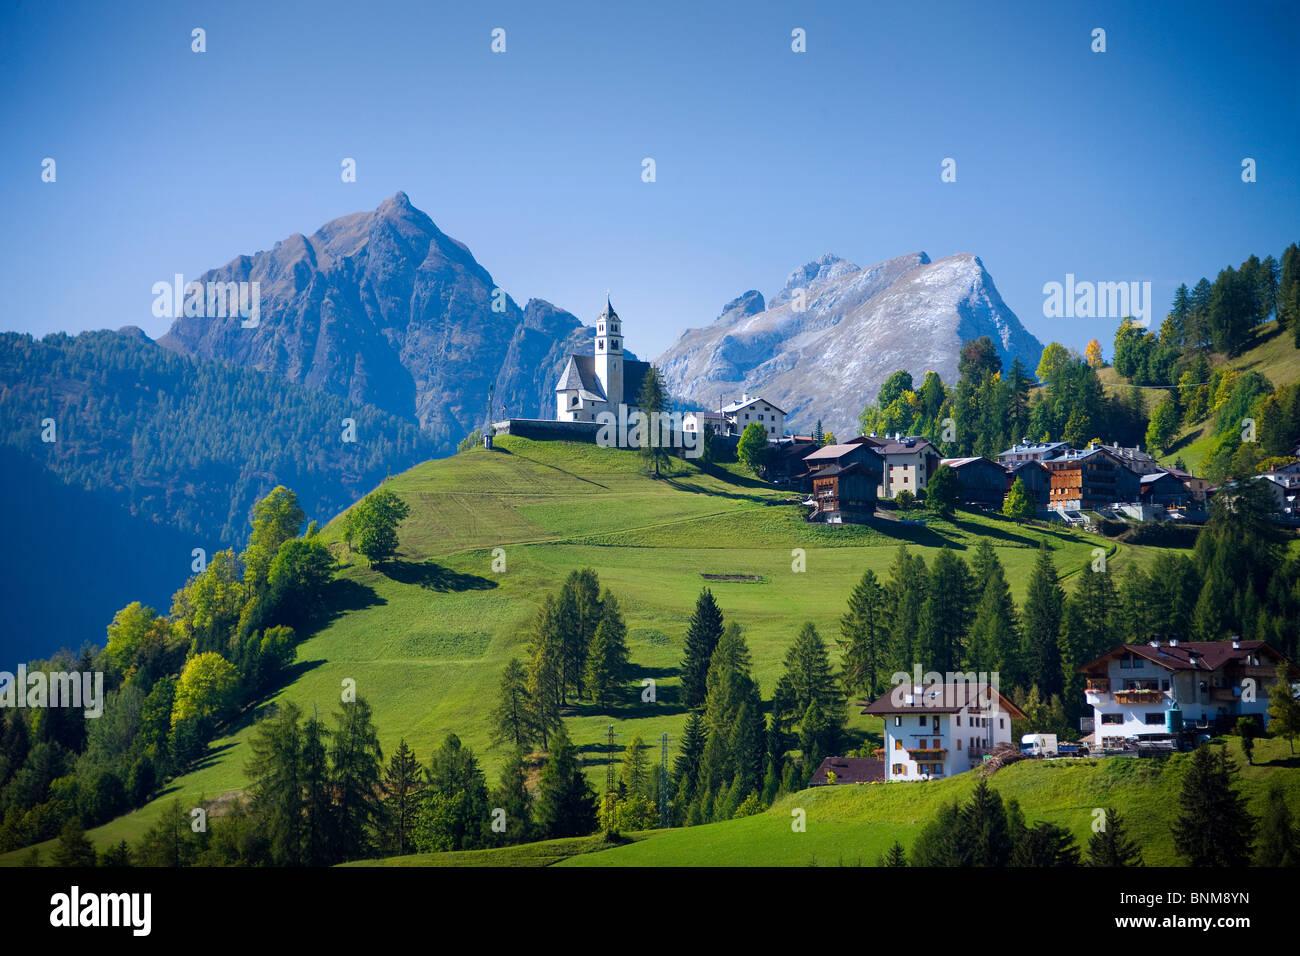 Reisen Italien Alpen Venetien Dolomiten Cadore Hill Holz Wald Wiesen Reisen, Stockfoto